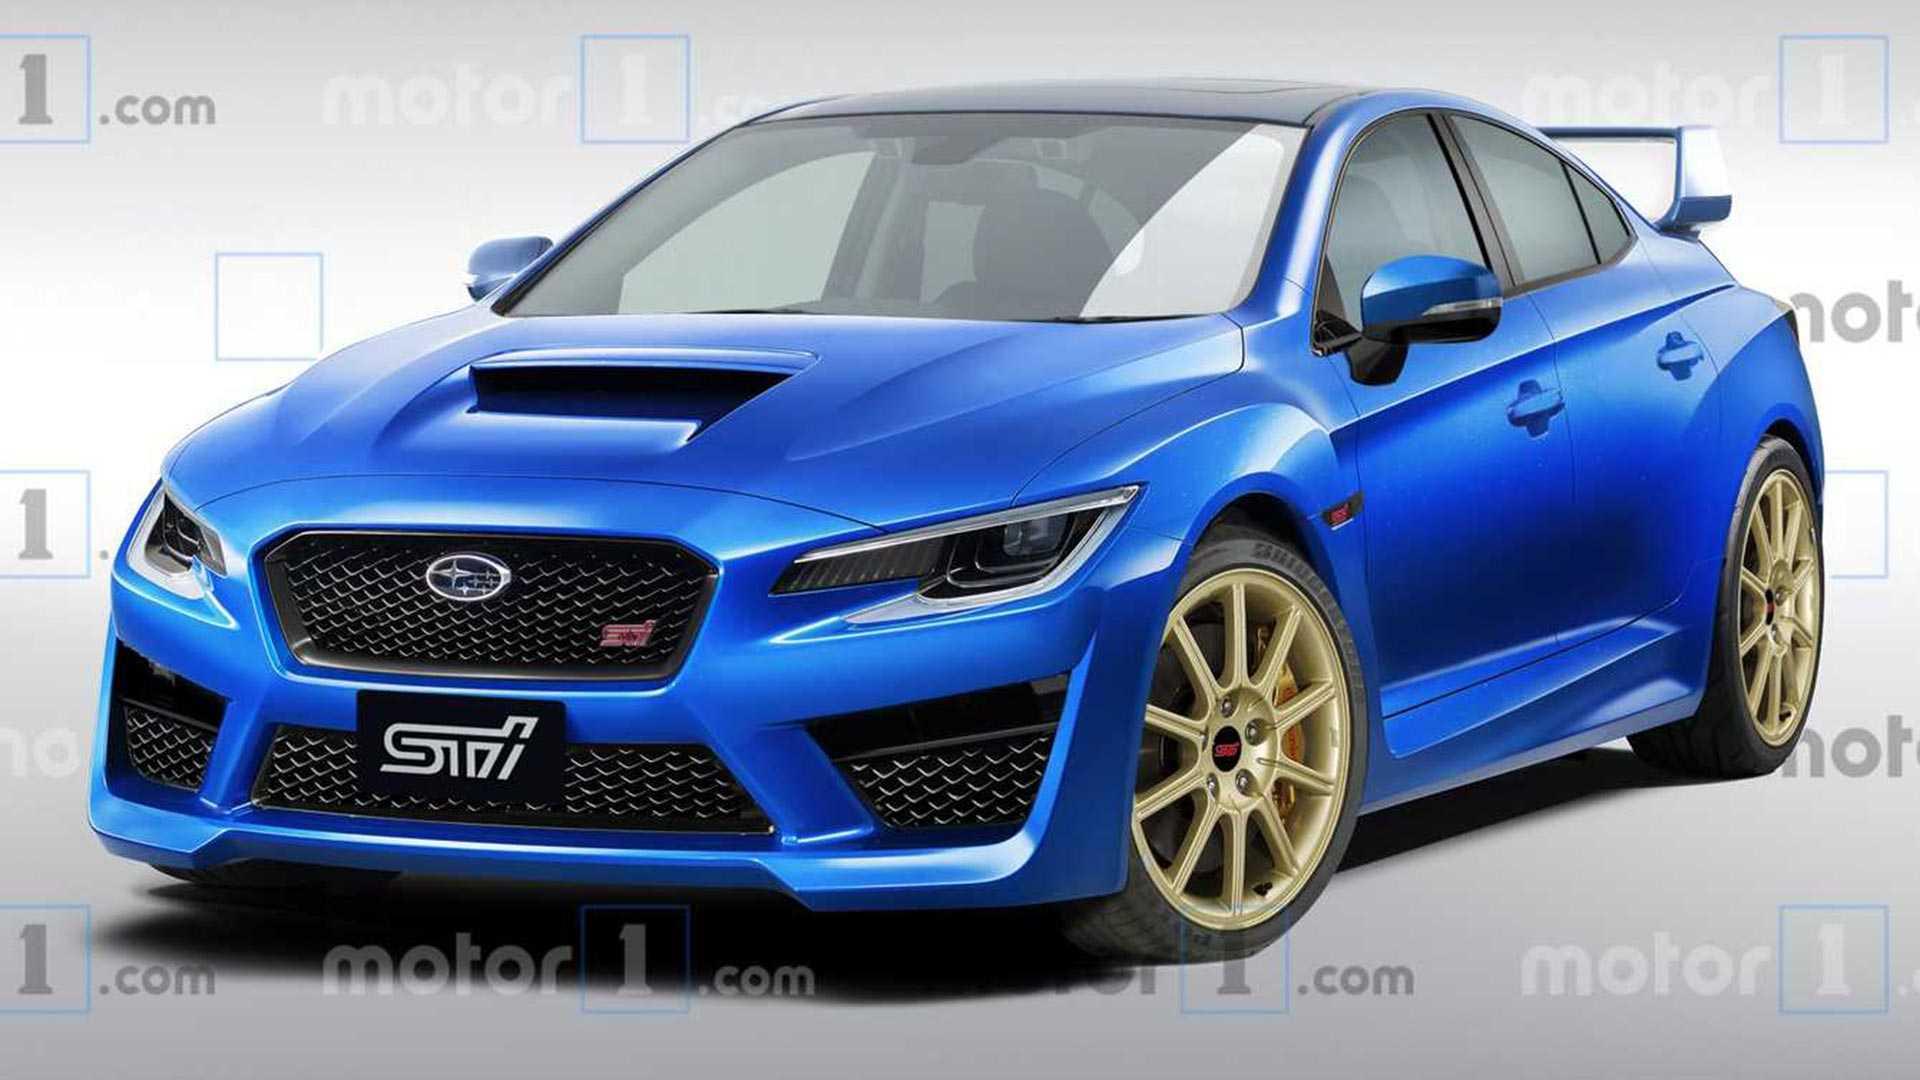 11 Gallery of Subaru Sti 2020 Concept Performance and New Engine for Subaru Sti 2020 Concept